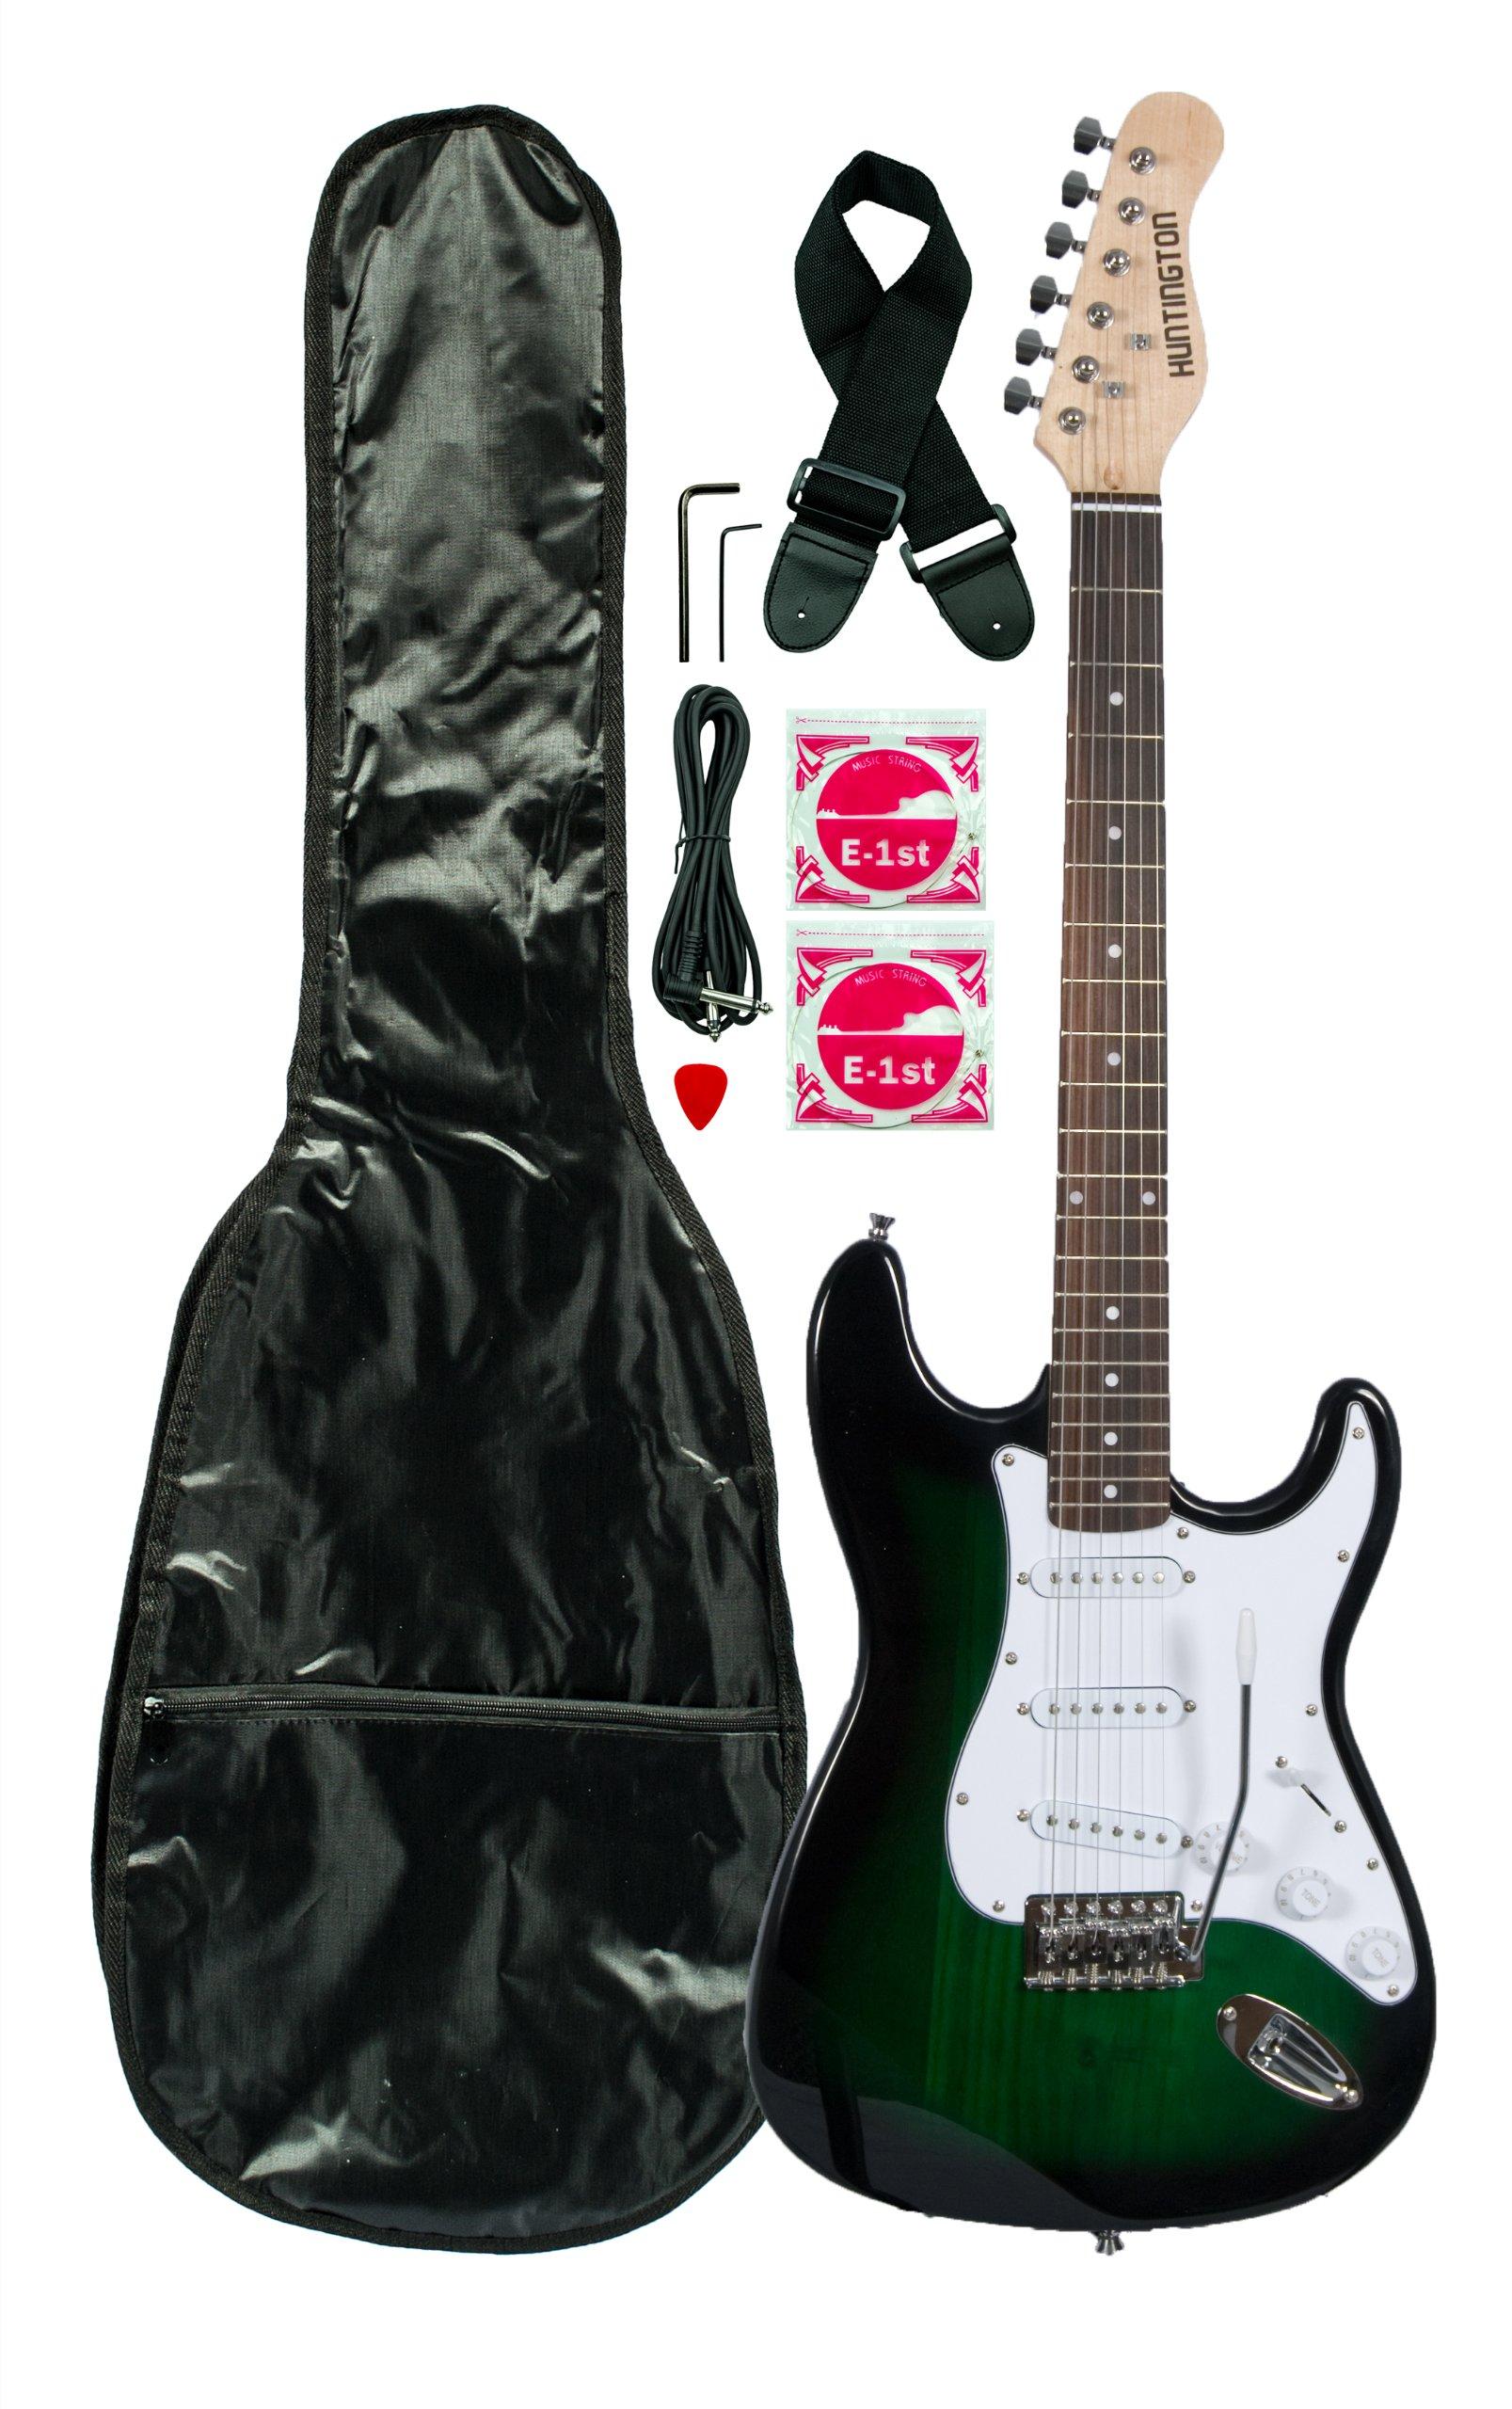 Cheap Huntington GE139-GRS Electric Guitar Pack Greenburst Black Friday & Cyber Monday 2019